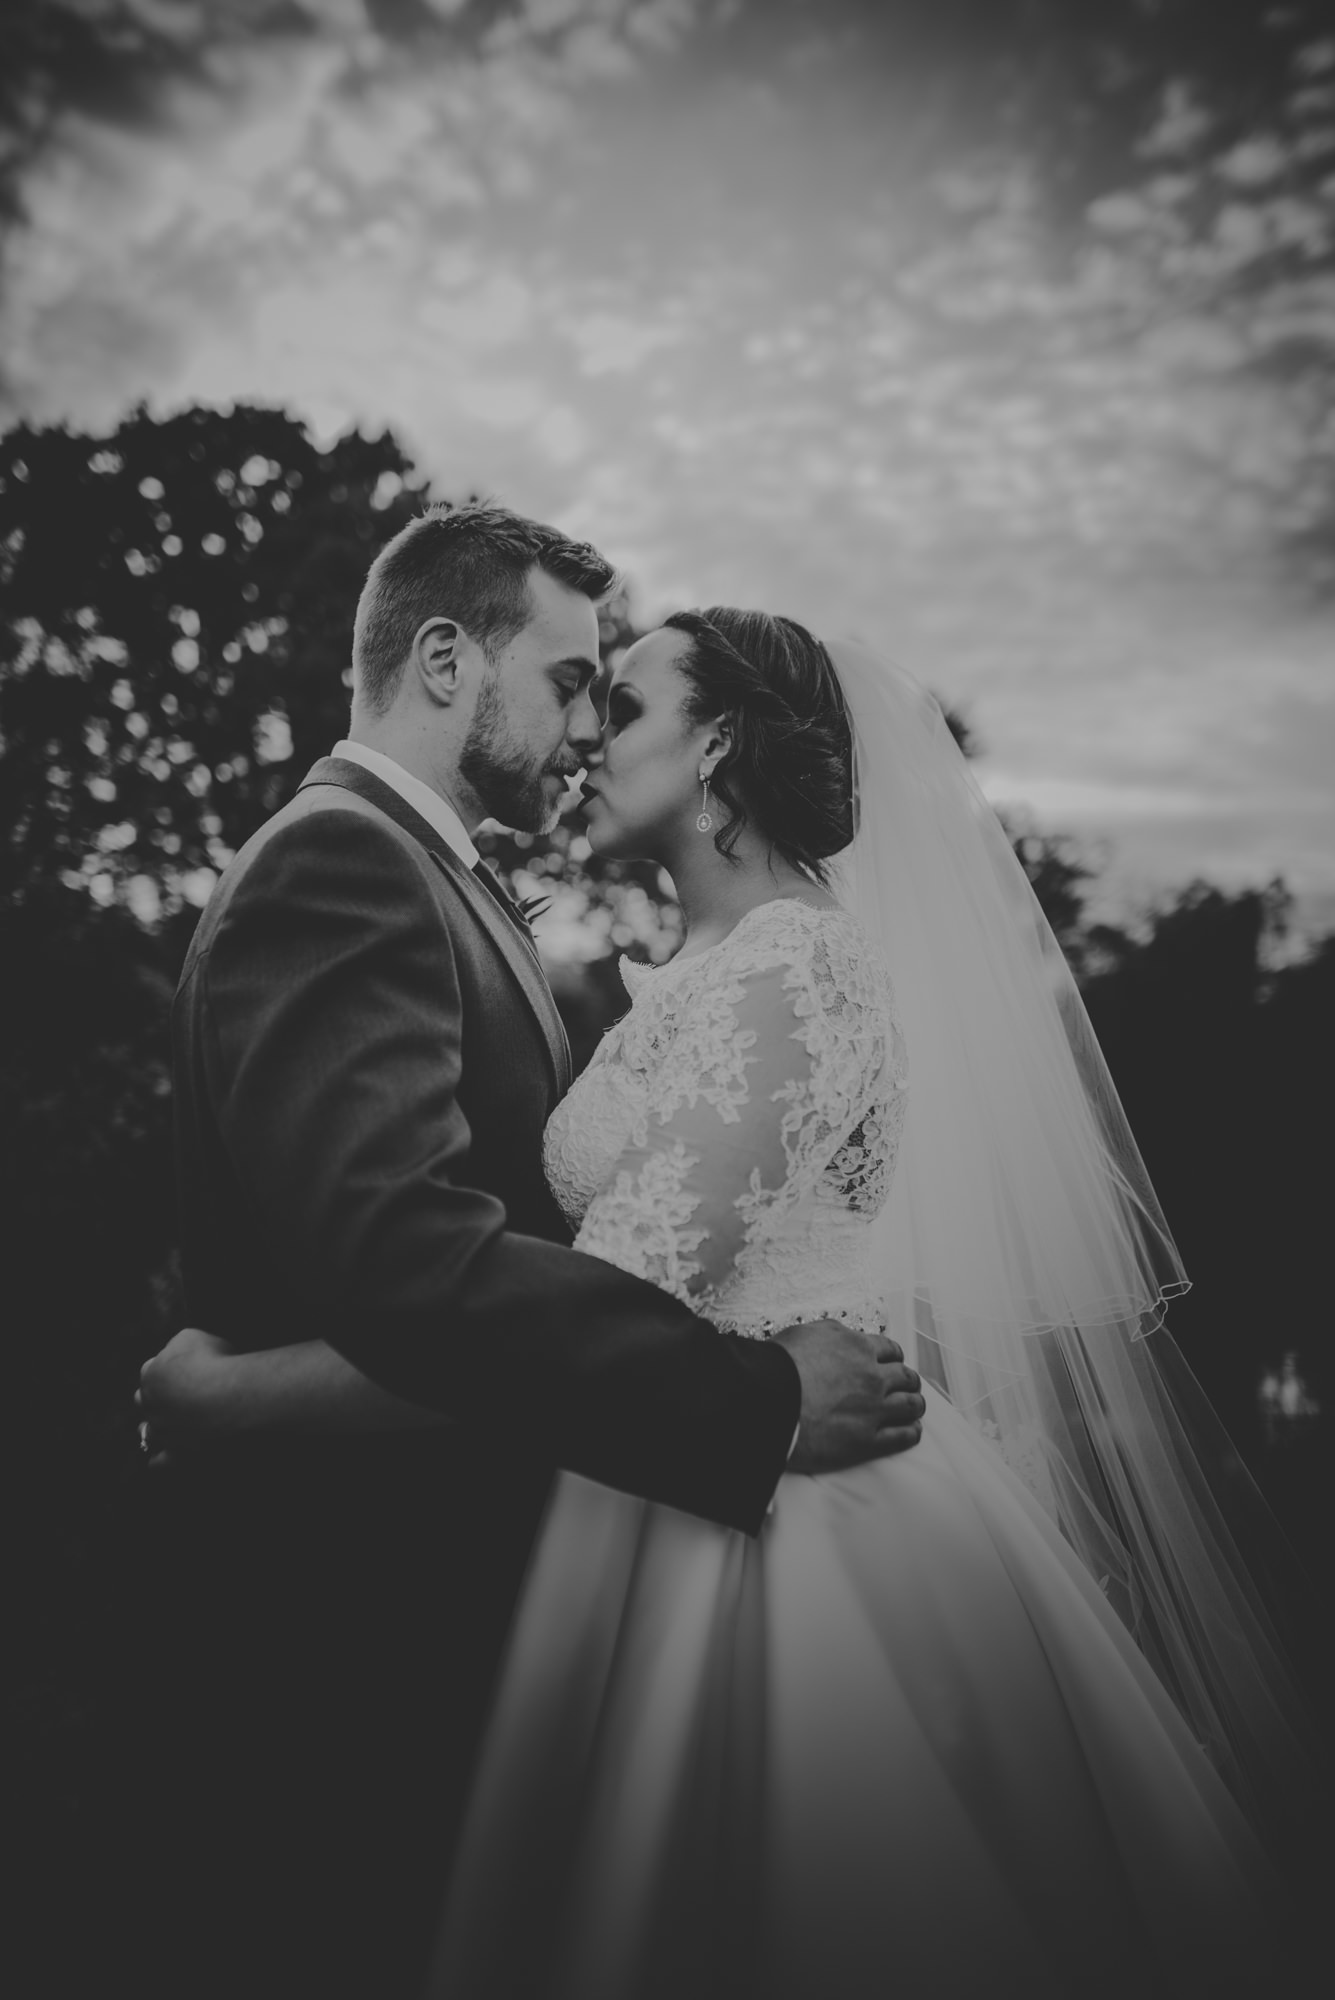 Jacqueline-Gareth-Wedding-Westmead-Events-Surrey-Manu-Mendoza-Wedding-Photography-495.jpg